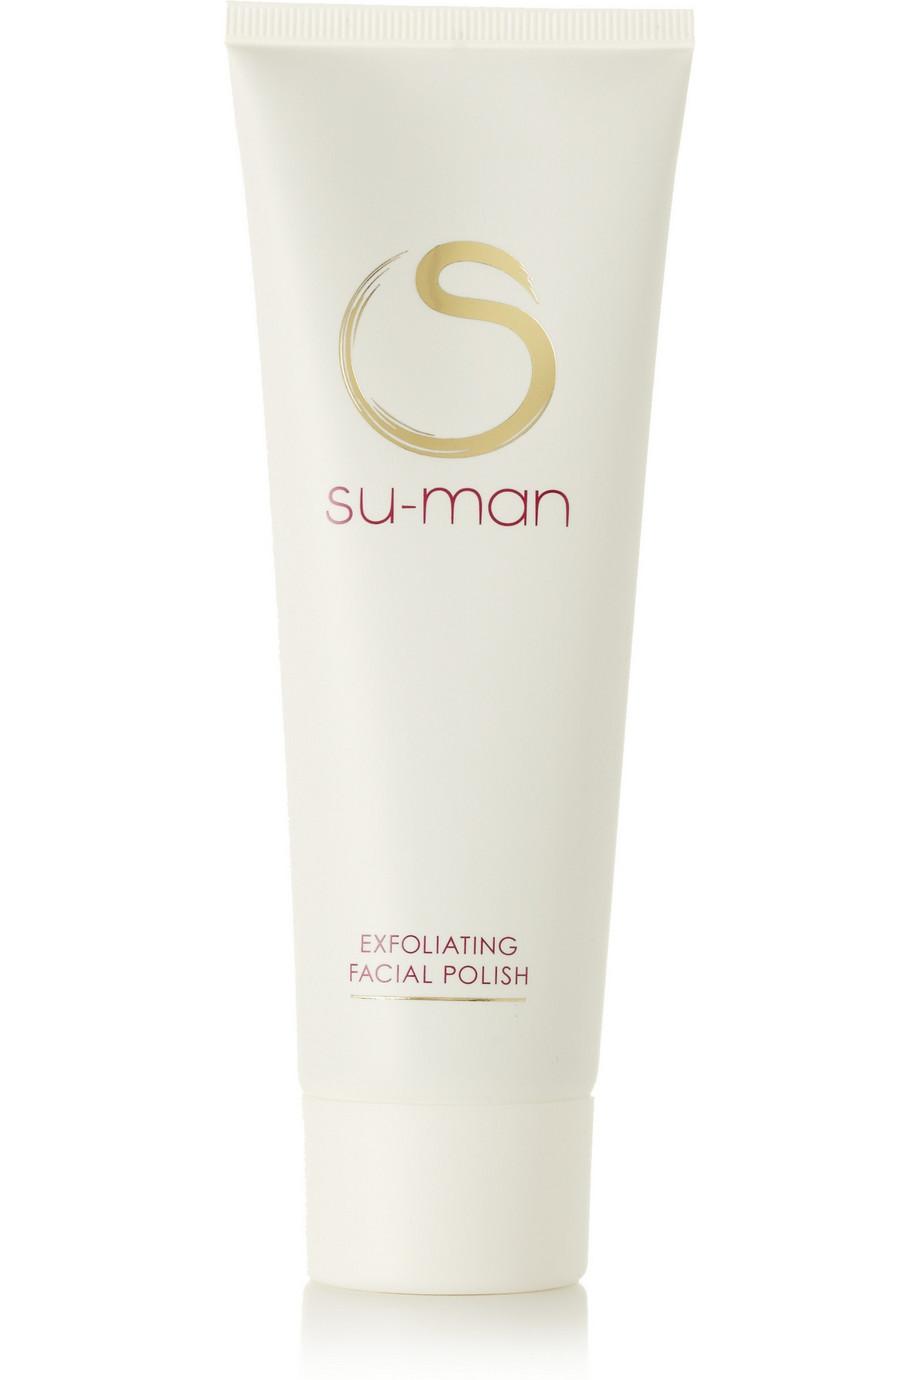 Exfoliating Facial Polish, 125ml, by Su-Man Skincare